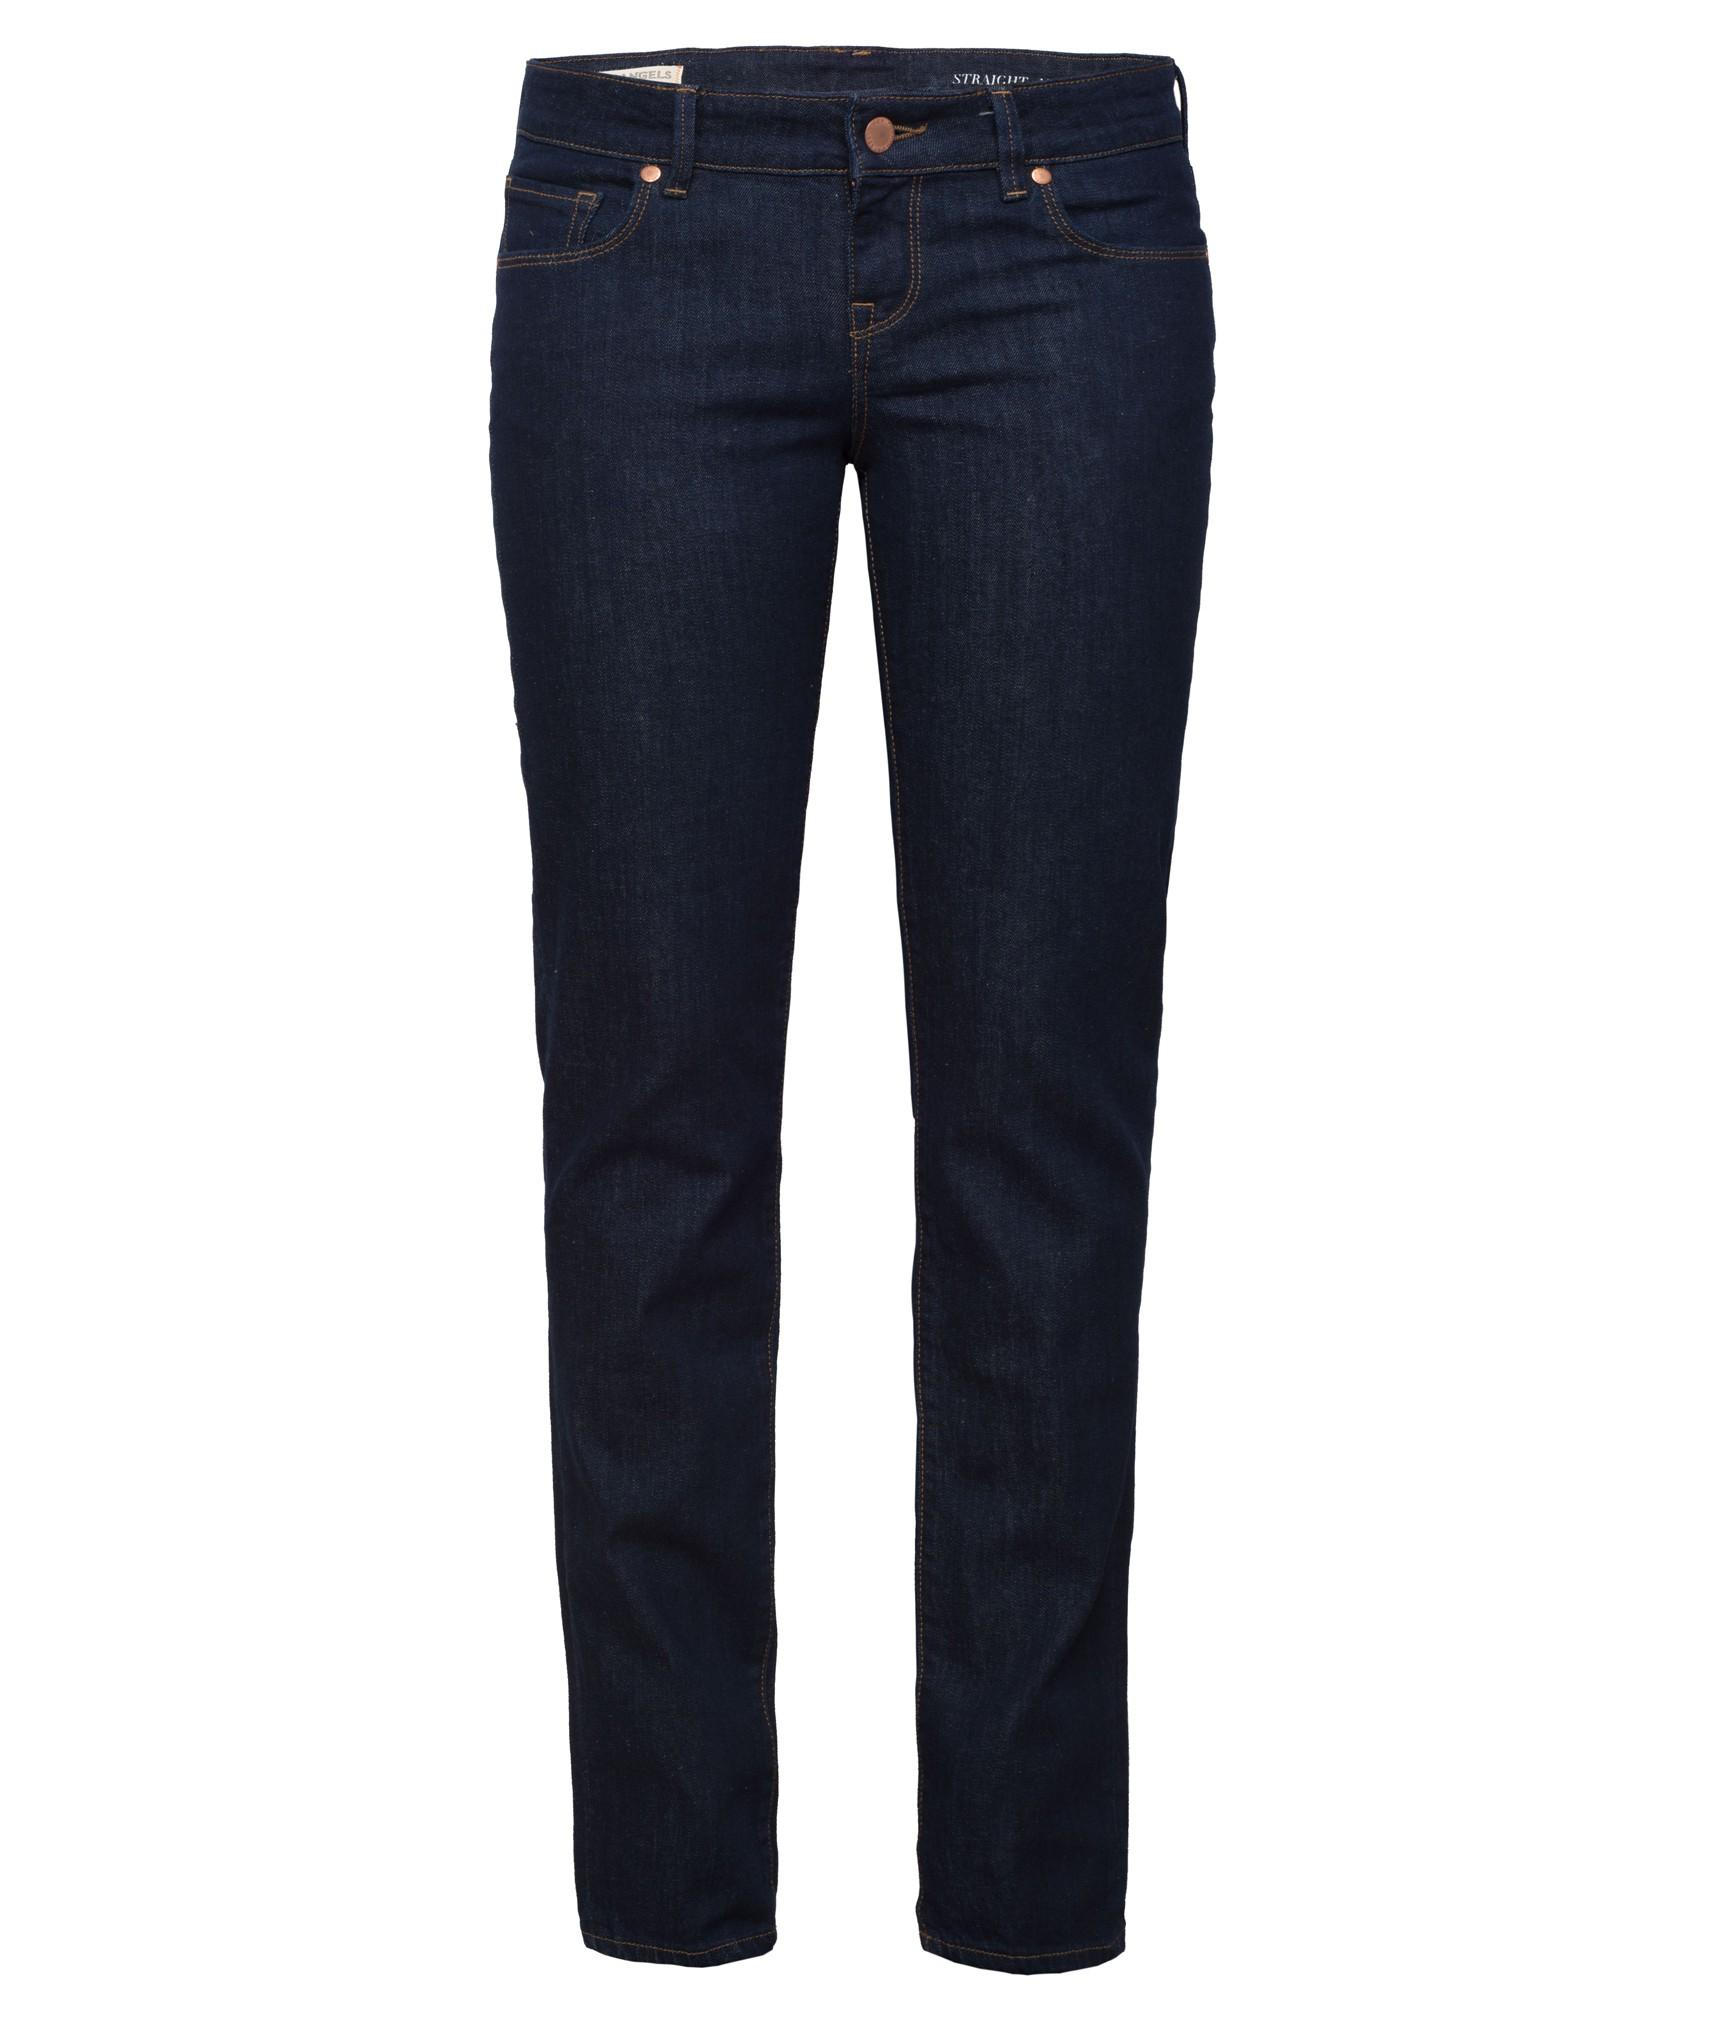 armedangels luma jeans bio jeans f r damen bei glore glore. Black Bedroom Furniture Sets. Home Design Ideas